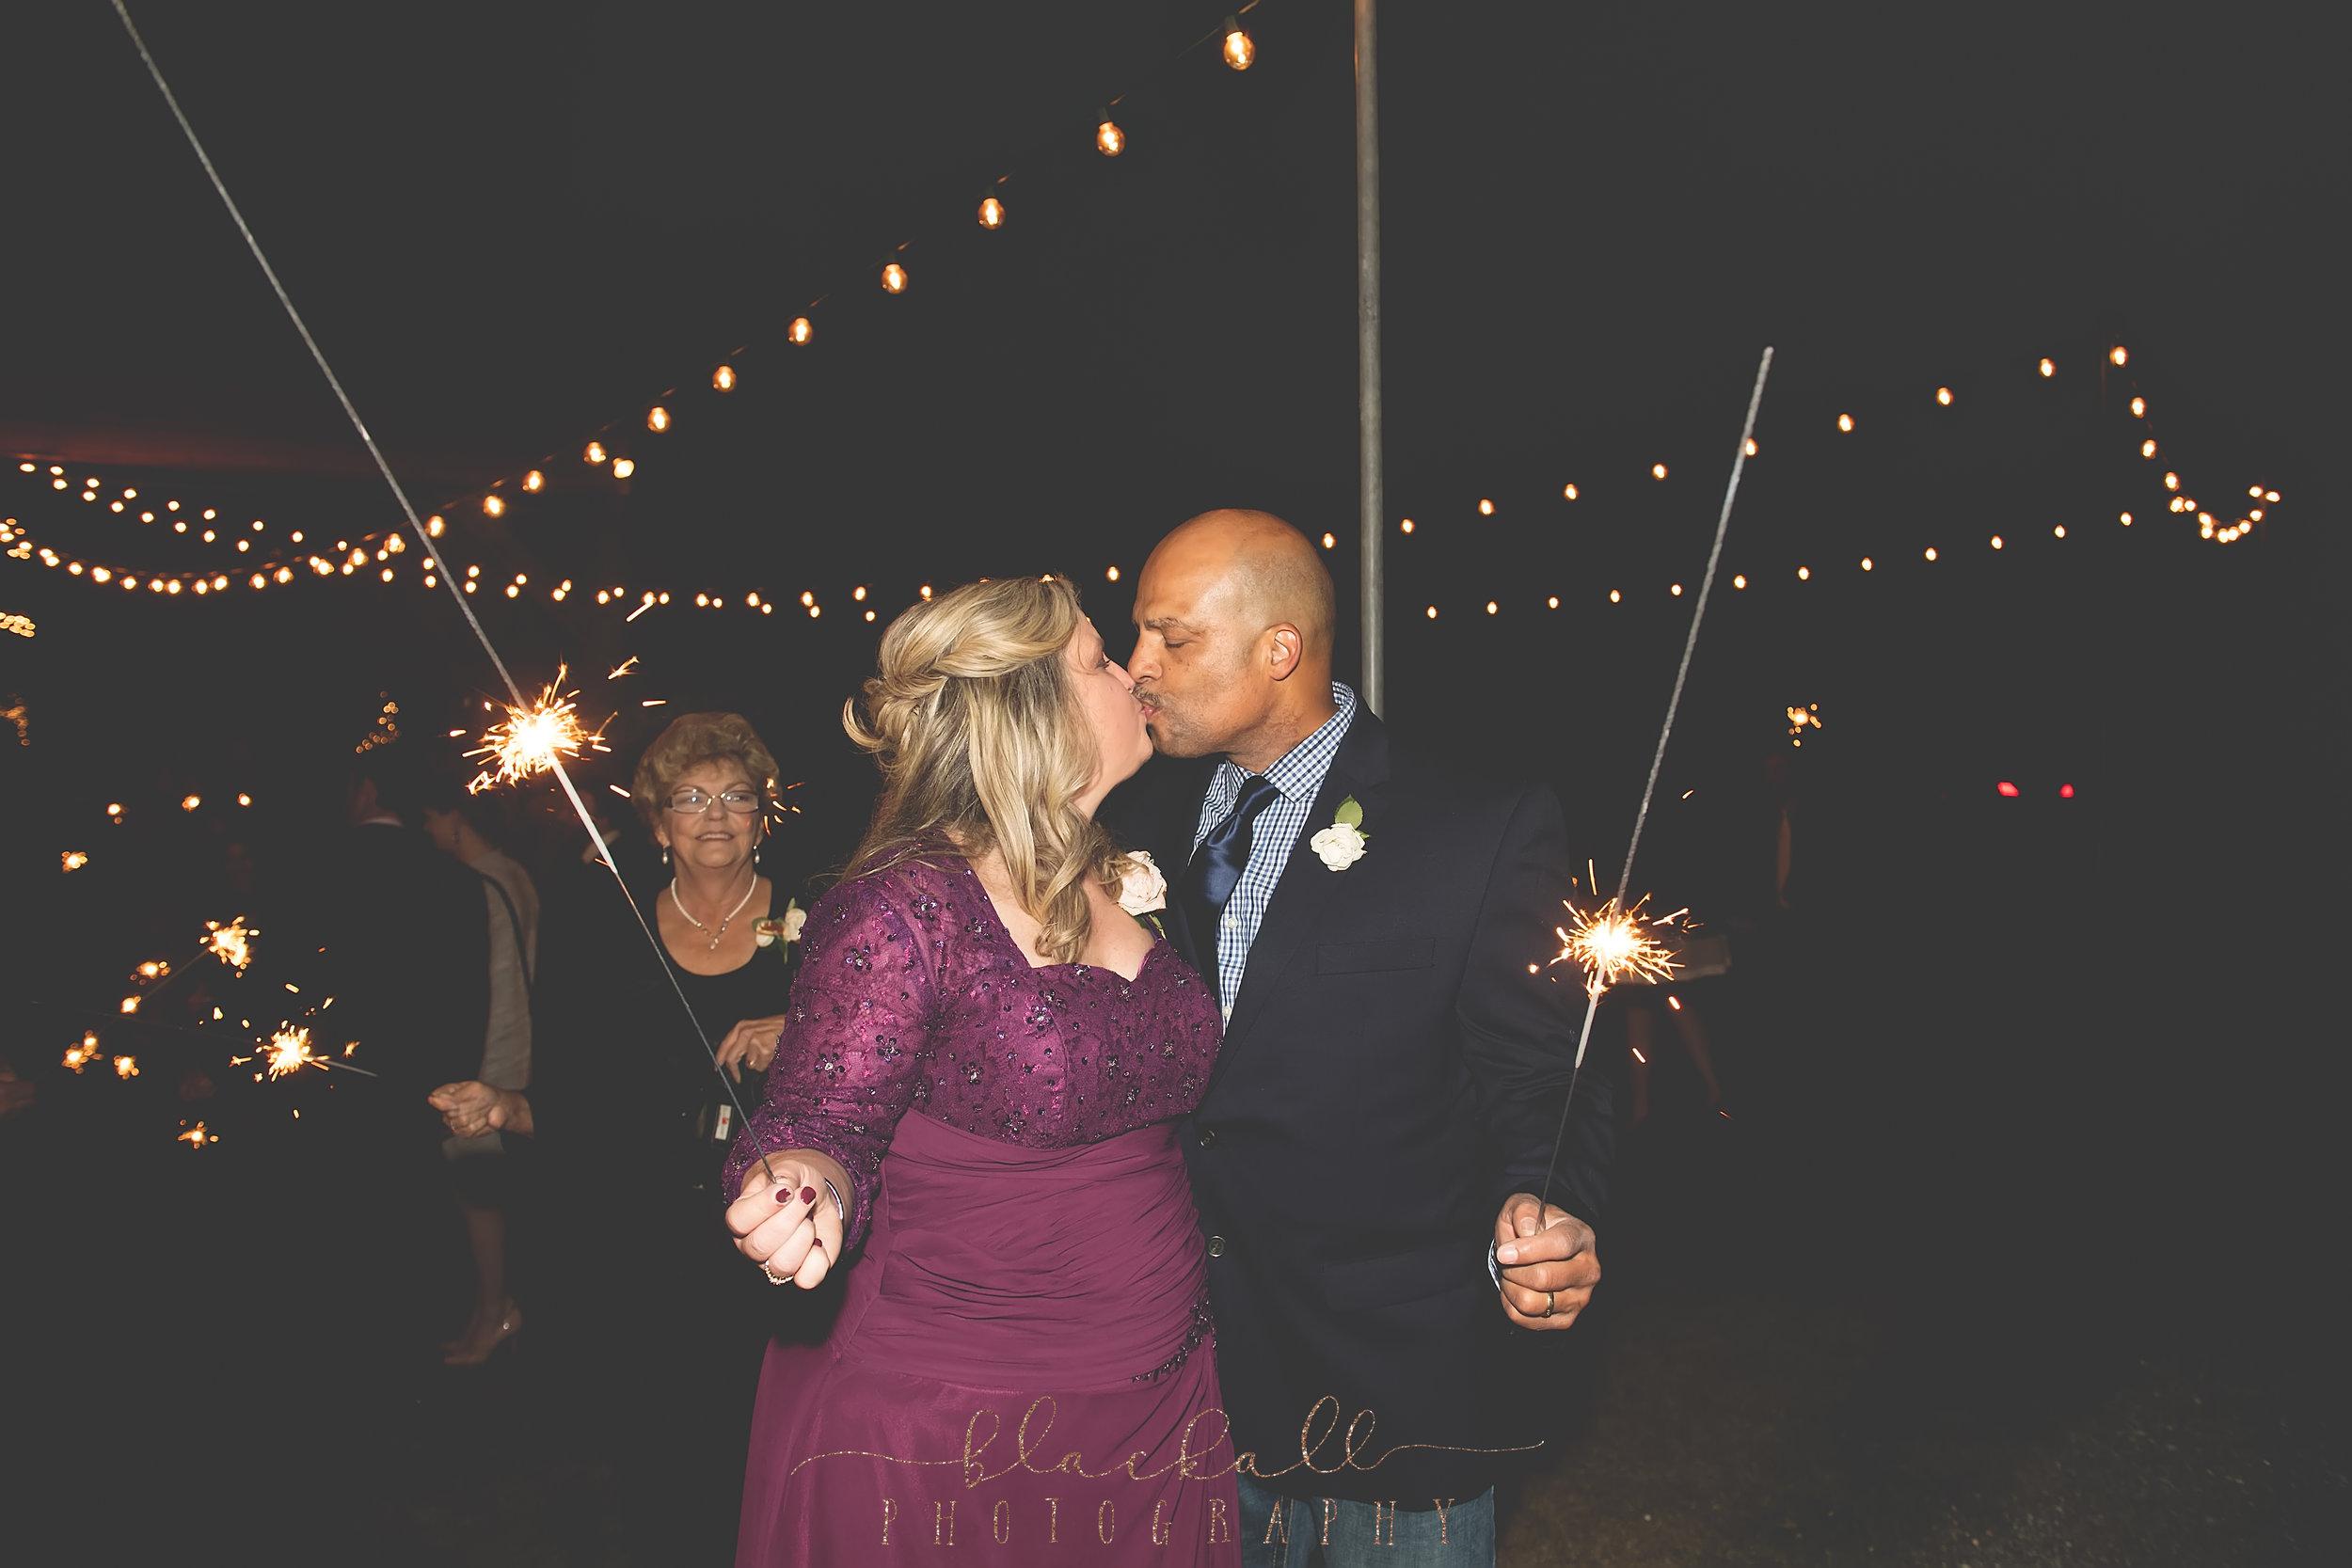 M&M WEDDING_Blackall Photography-101.JPG